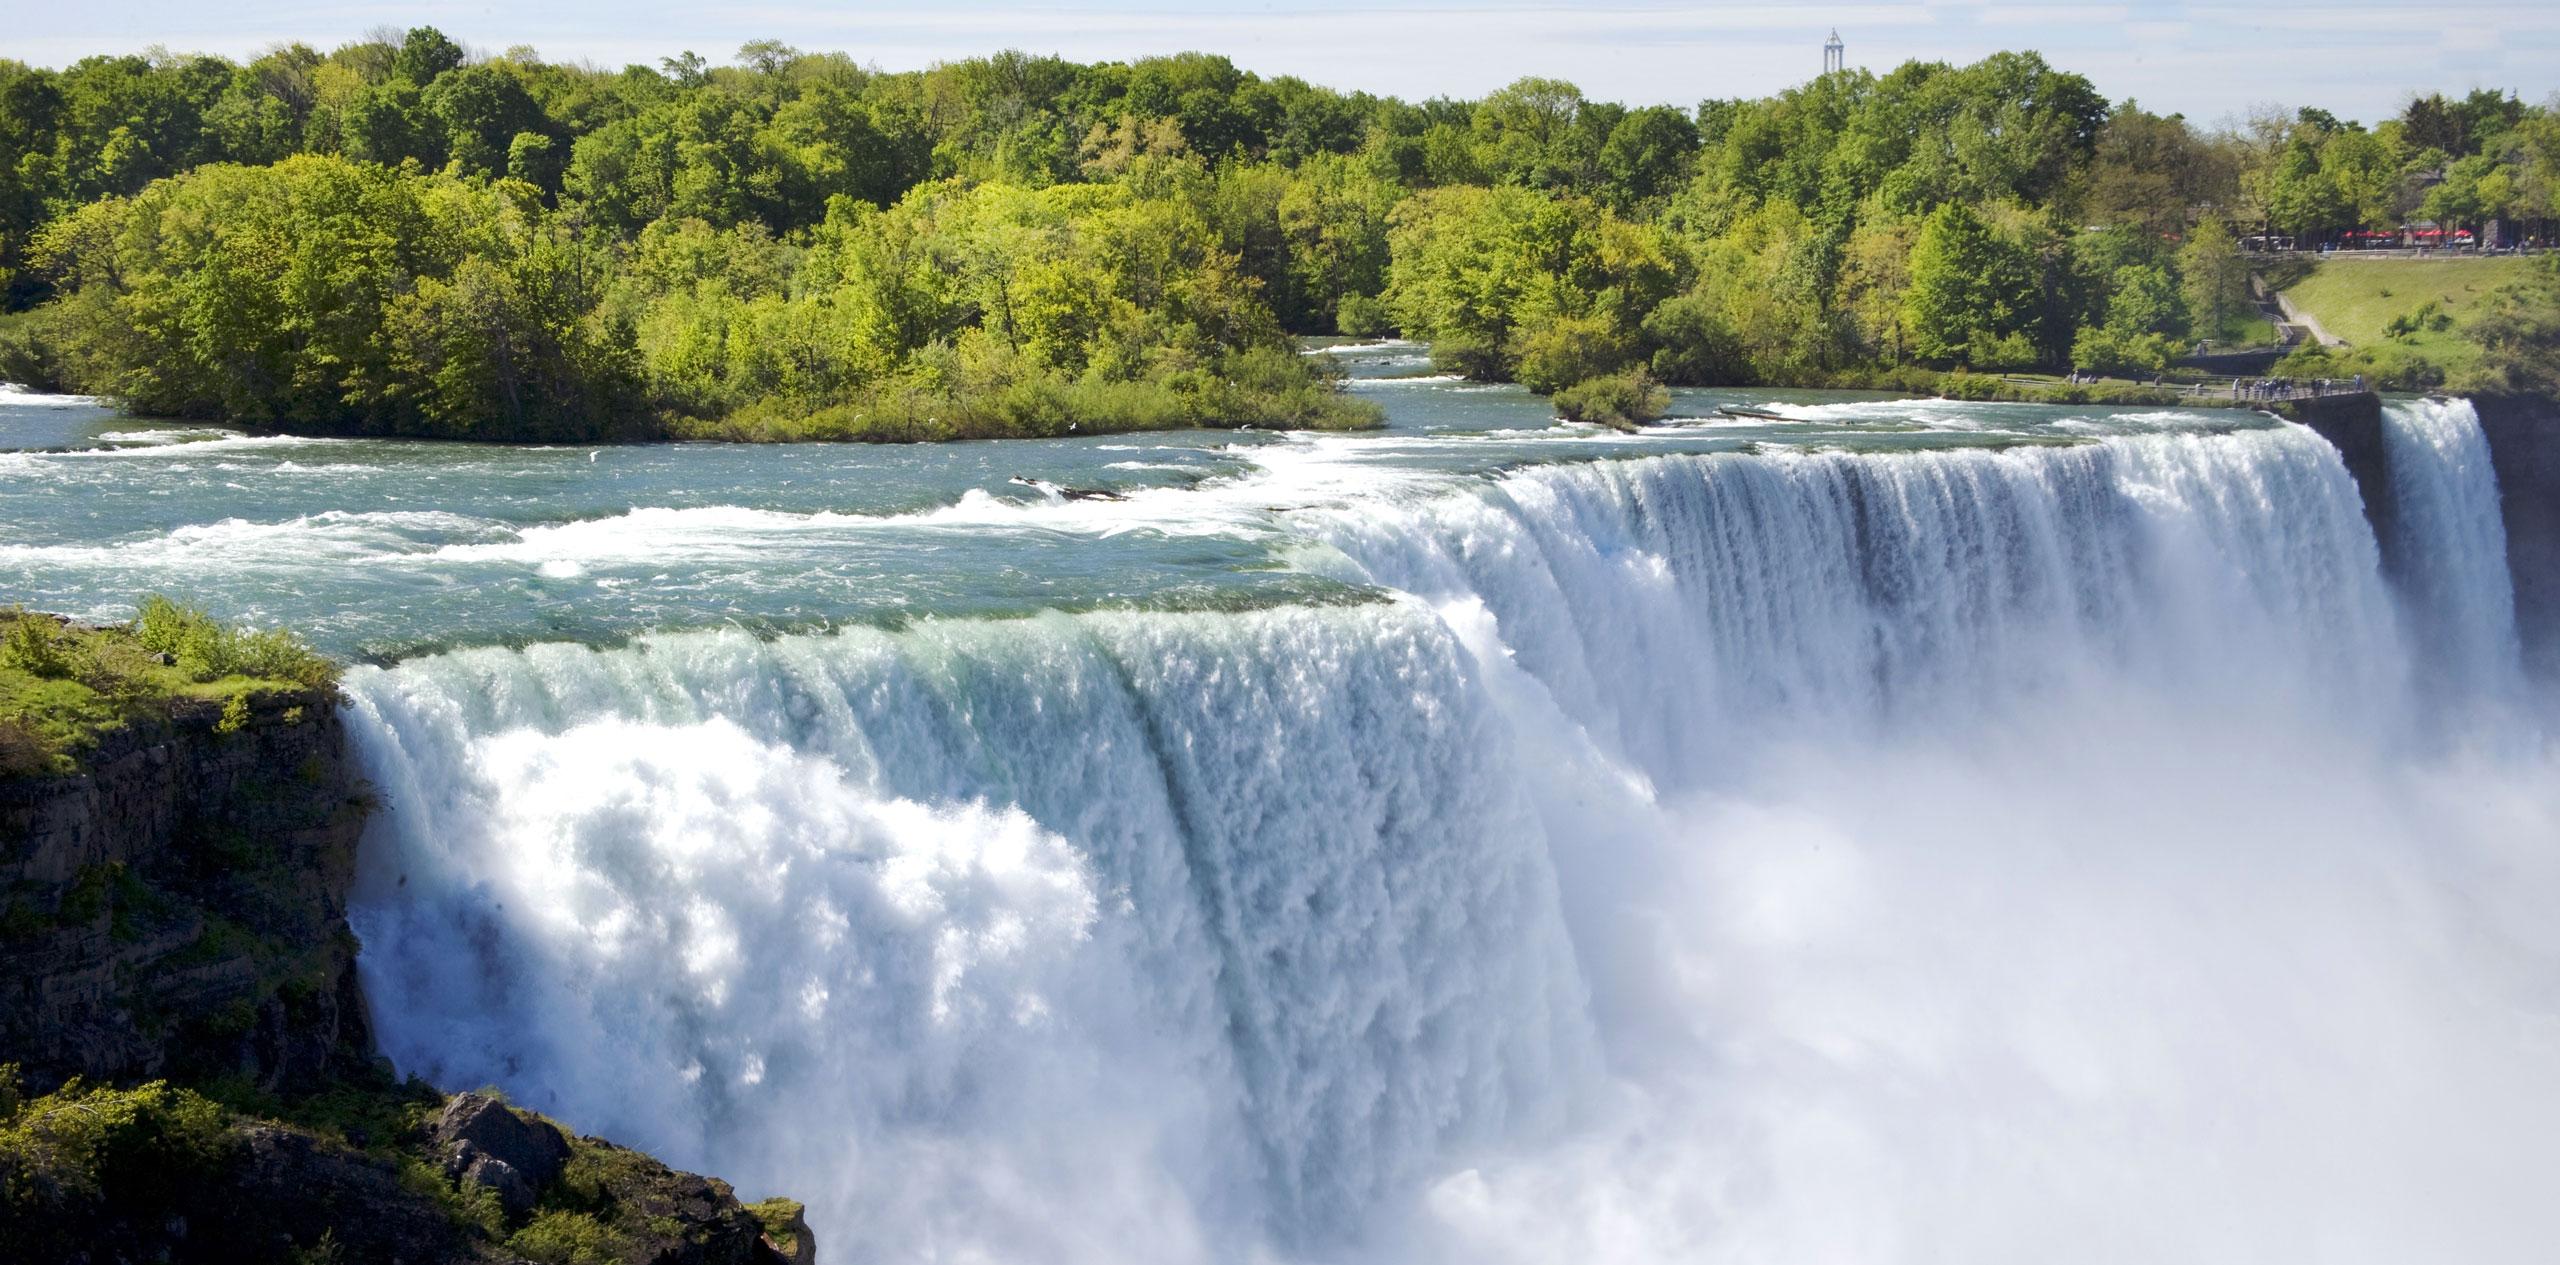 Niagara Falls - American Falls view